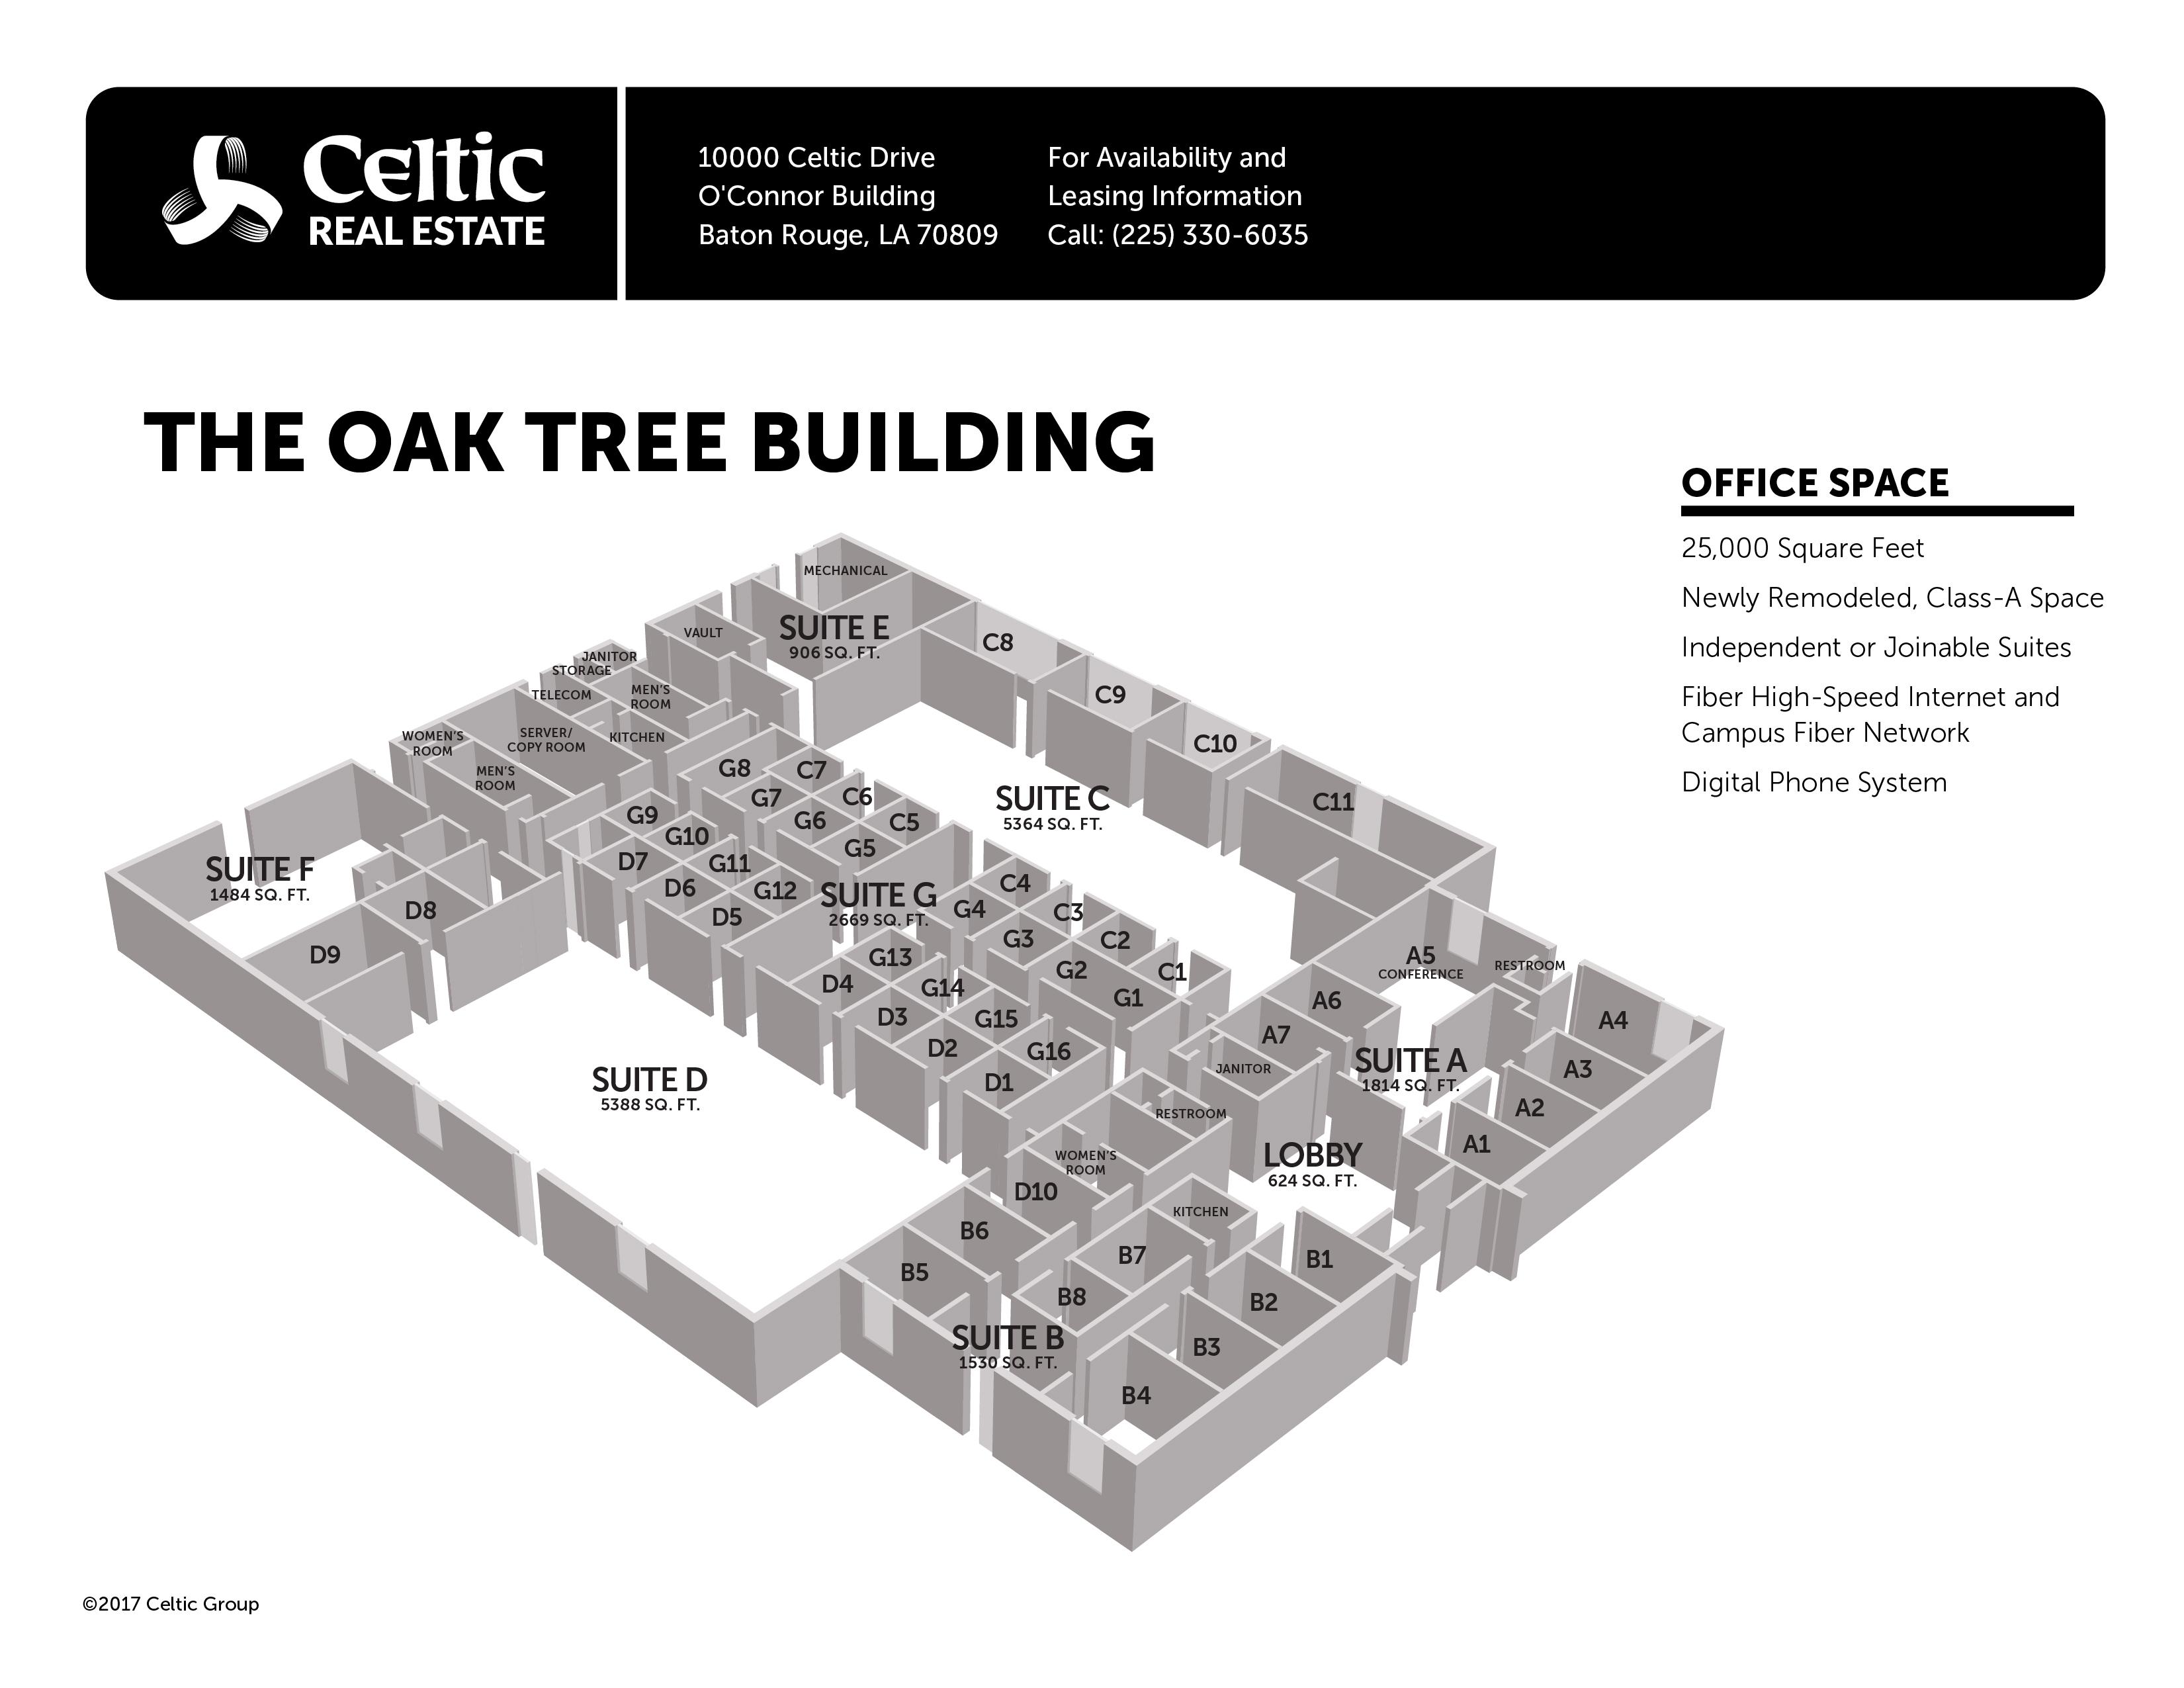 Celtic Real Estate Celtic Media Centre Baton Rouge LA The